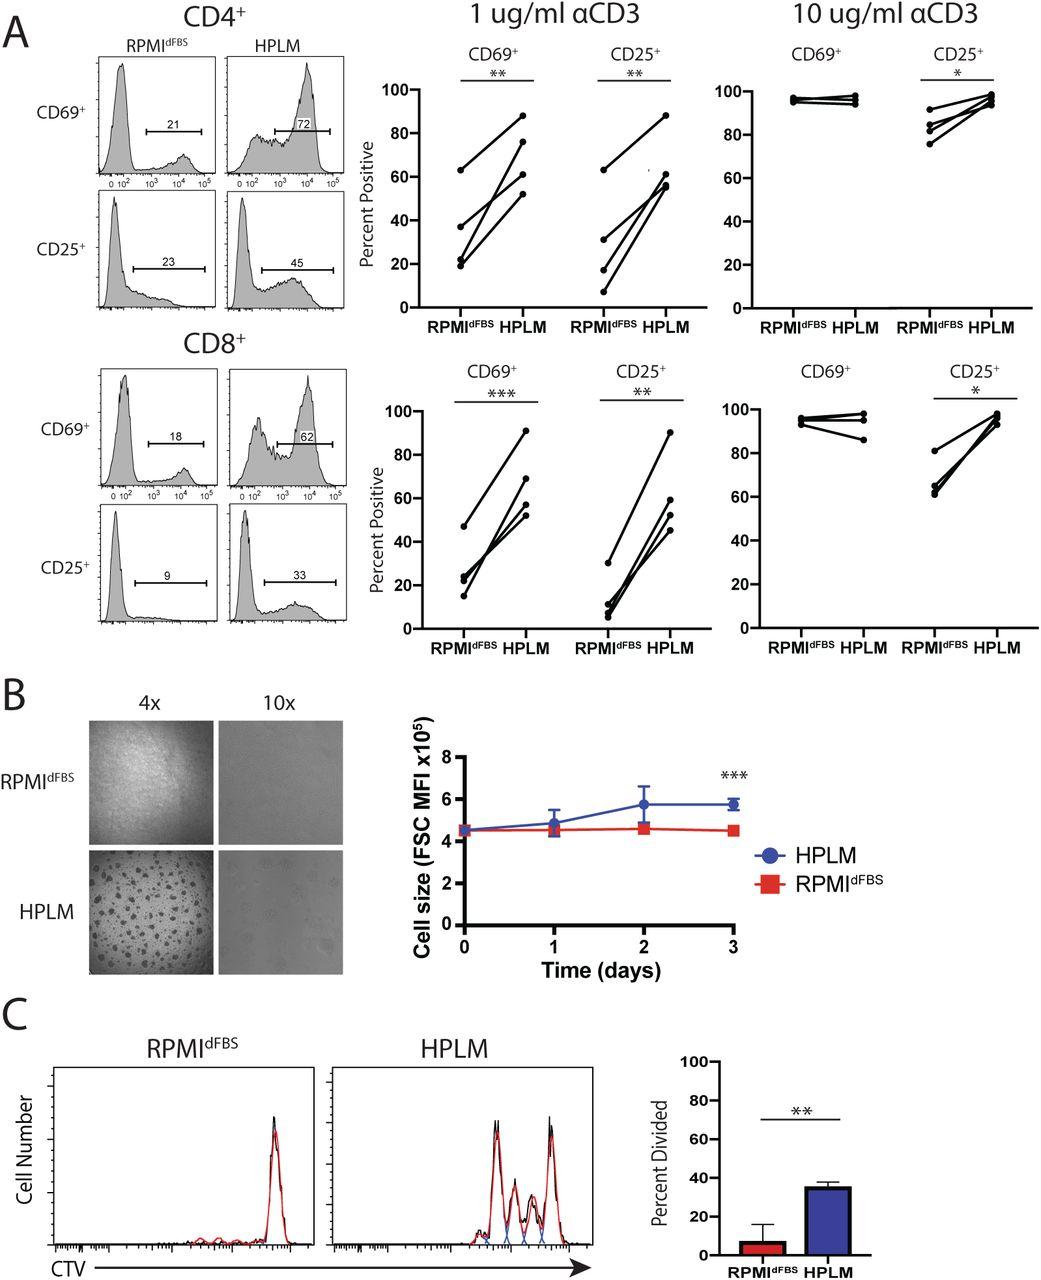 Human plasma-like medium improves T lymphocyte activation